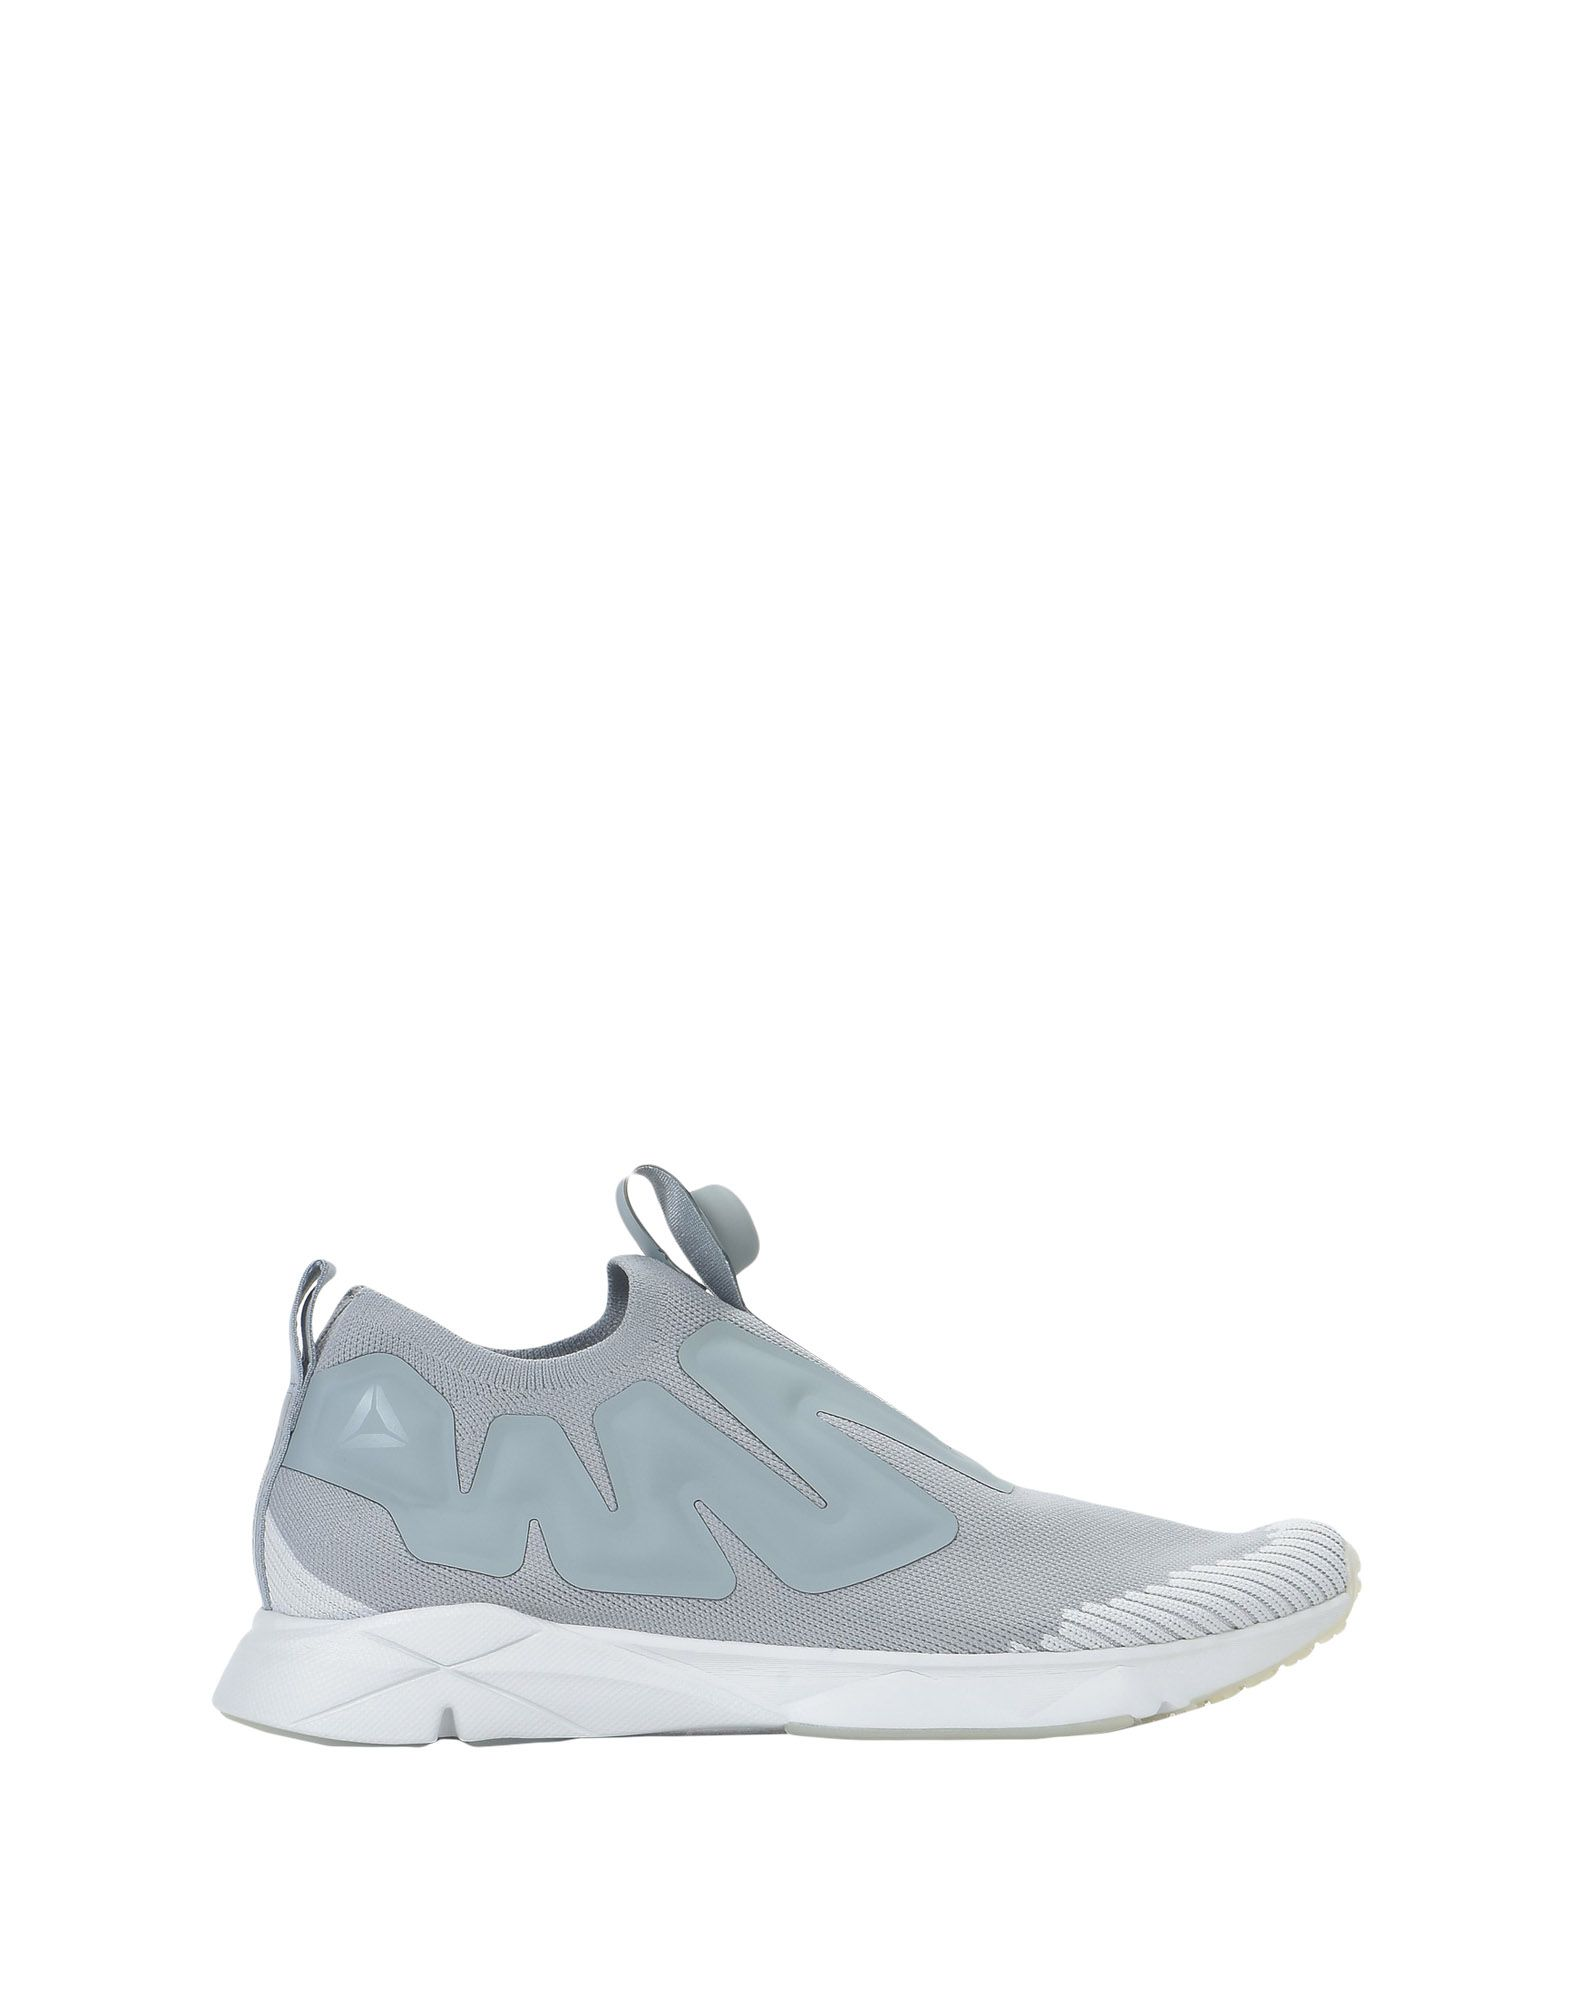 Reebok 11495327AS Reebok Pump Supreme  11495327AS Reebok Gute Qualität beliebte Schuhe fb74cf